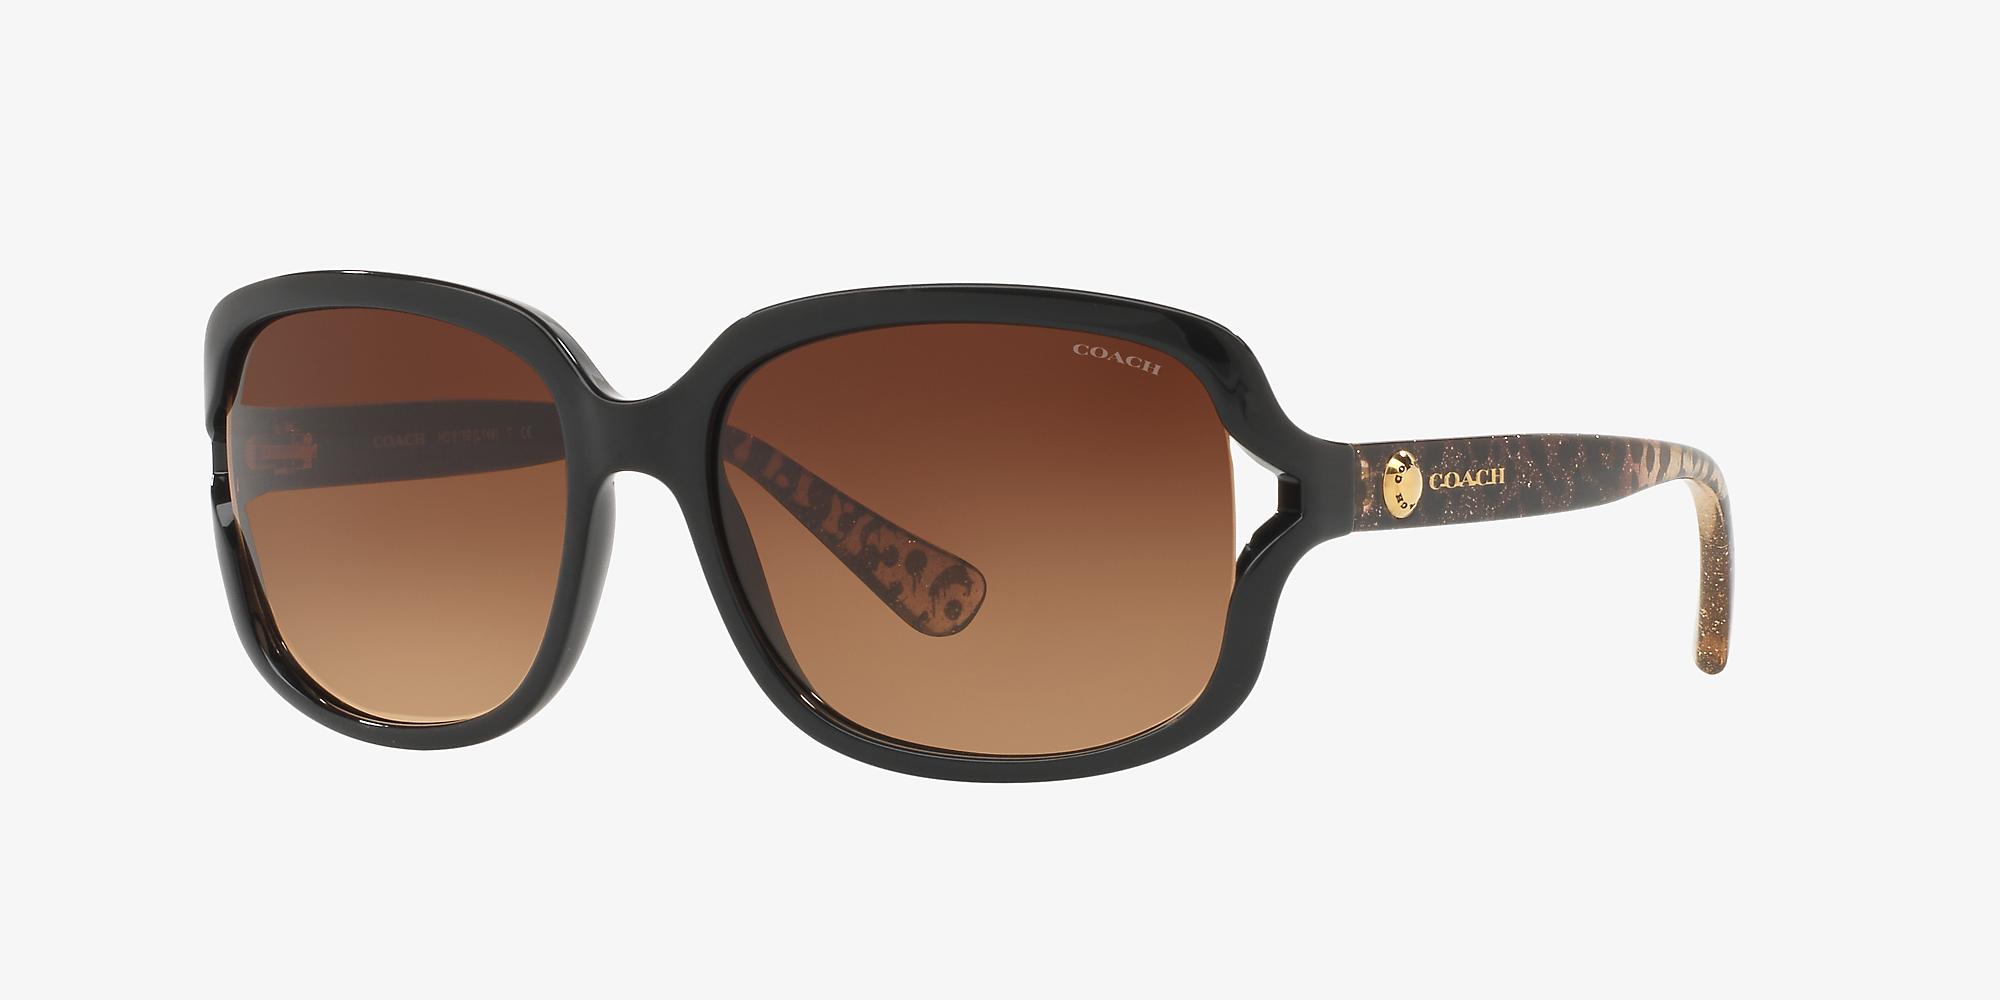 7373f5e1b673 Coach HC8169 57 Brown & Black Sunglasses | Sunglass Hut USA